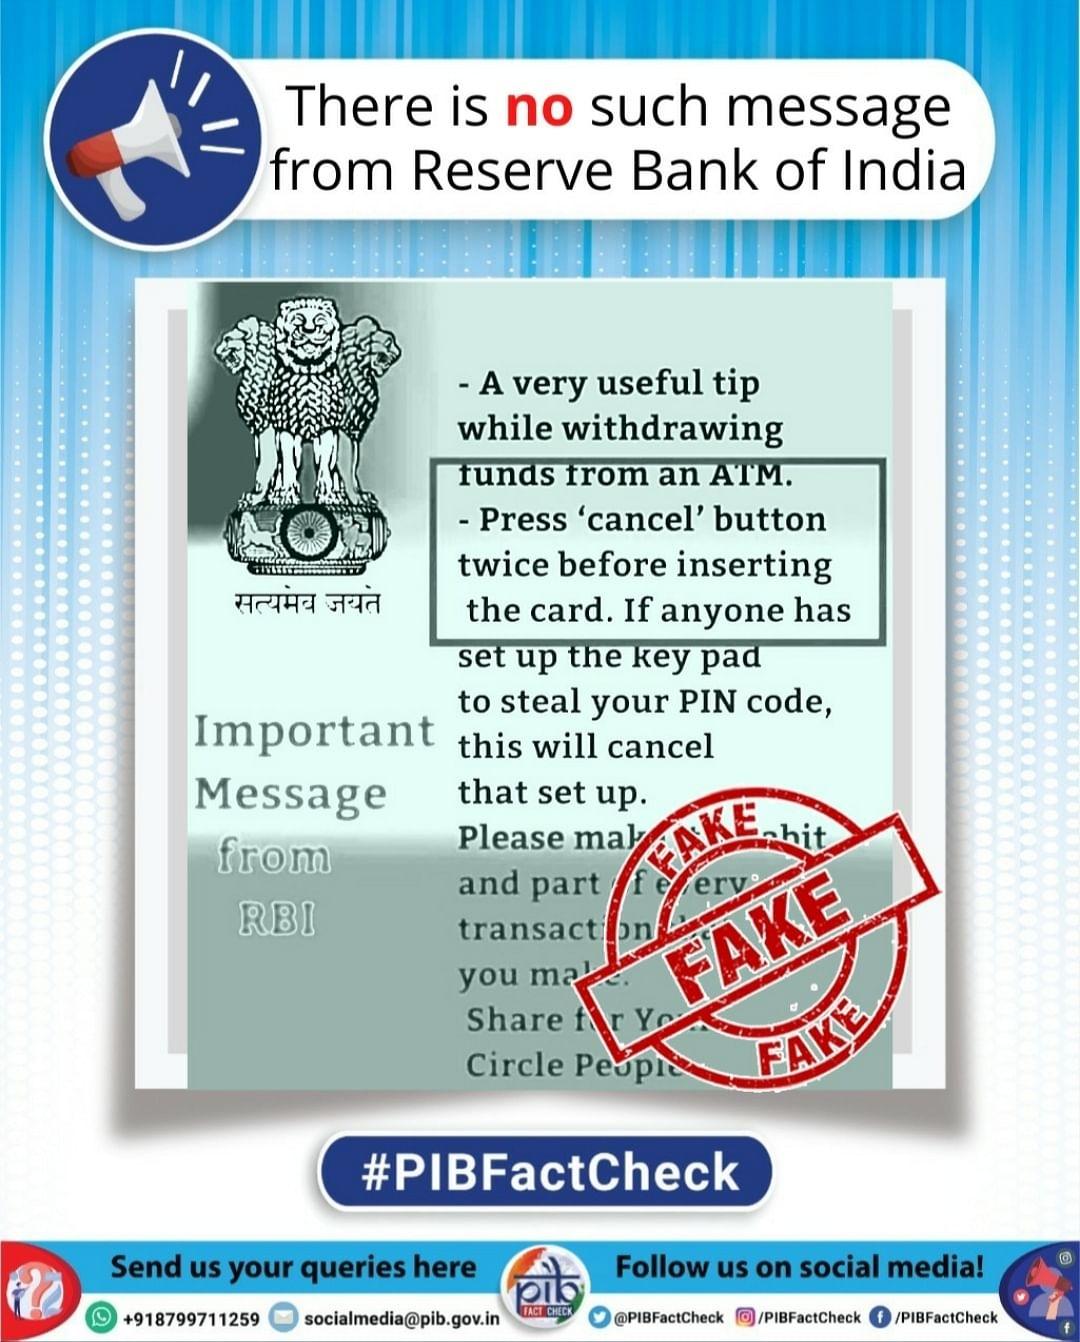 ATM-இல் கார்டை நுழைக்கும் முன்பு இருமுறை கேன்சல் பட்டனை அழுத்த வேண்டுமா?- #Factcheck #MyVikatan